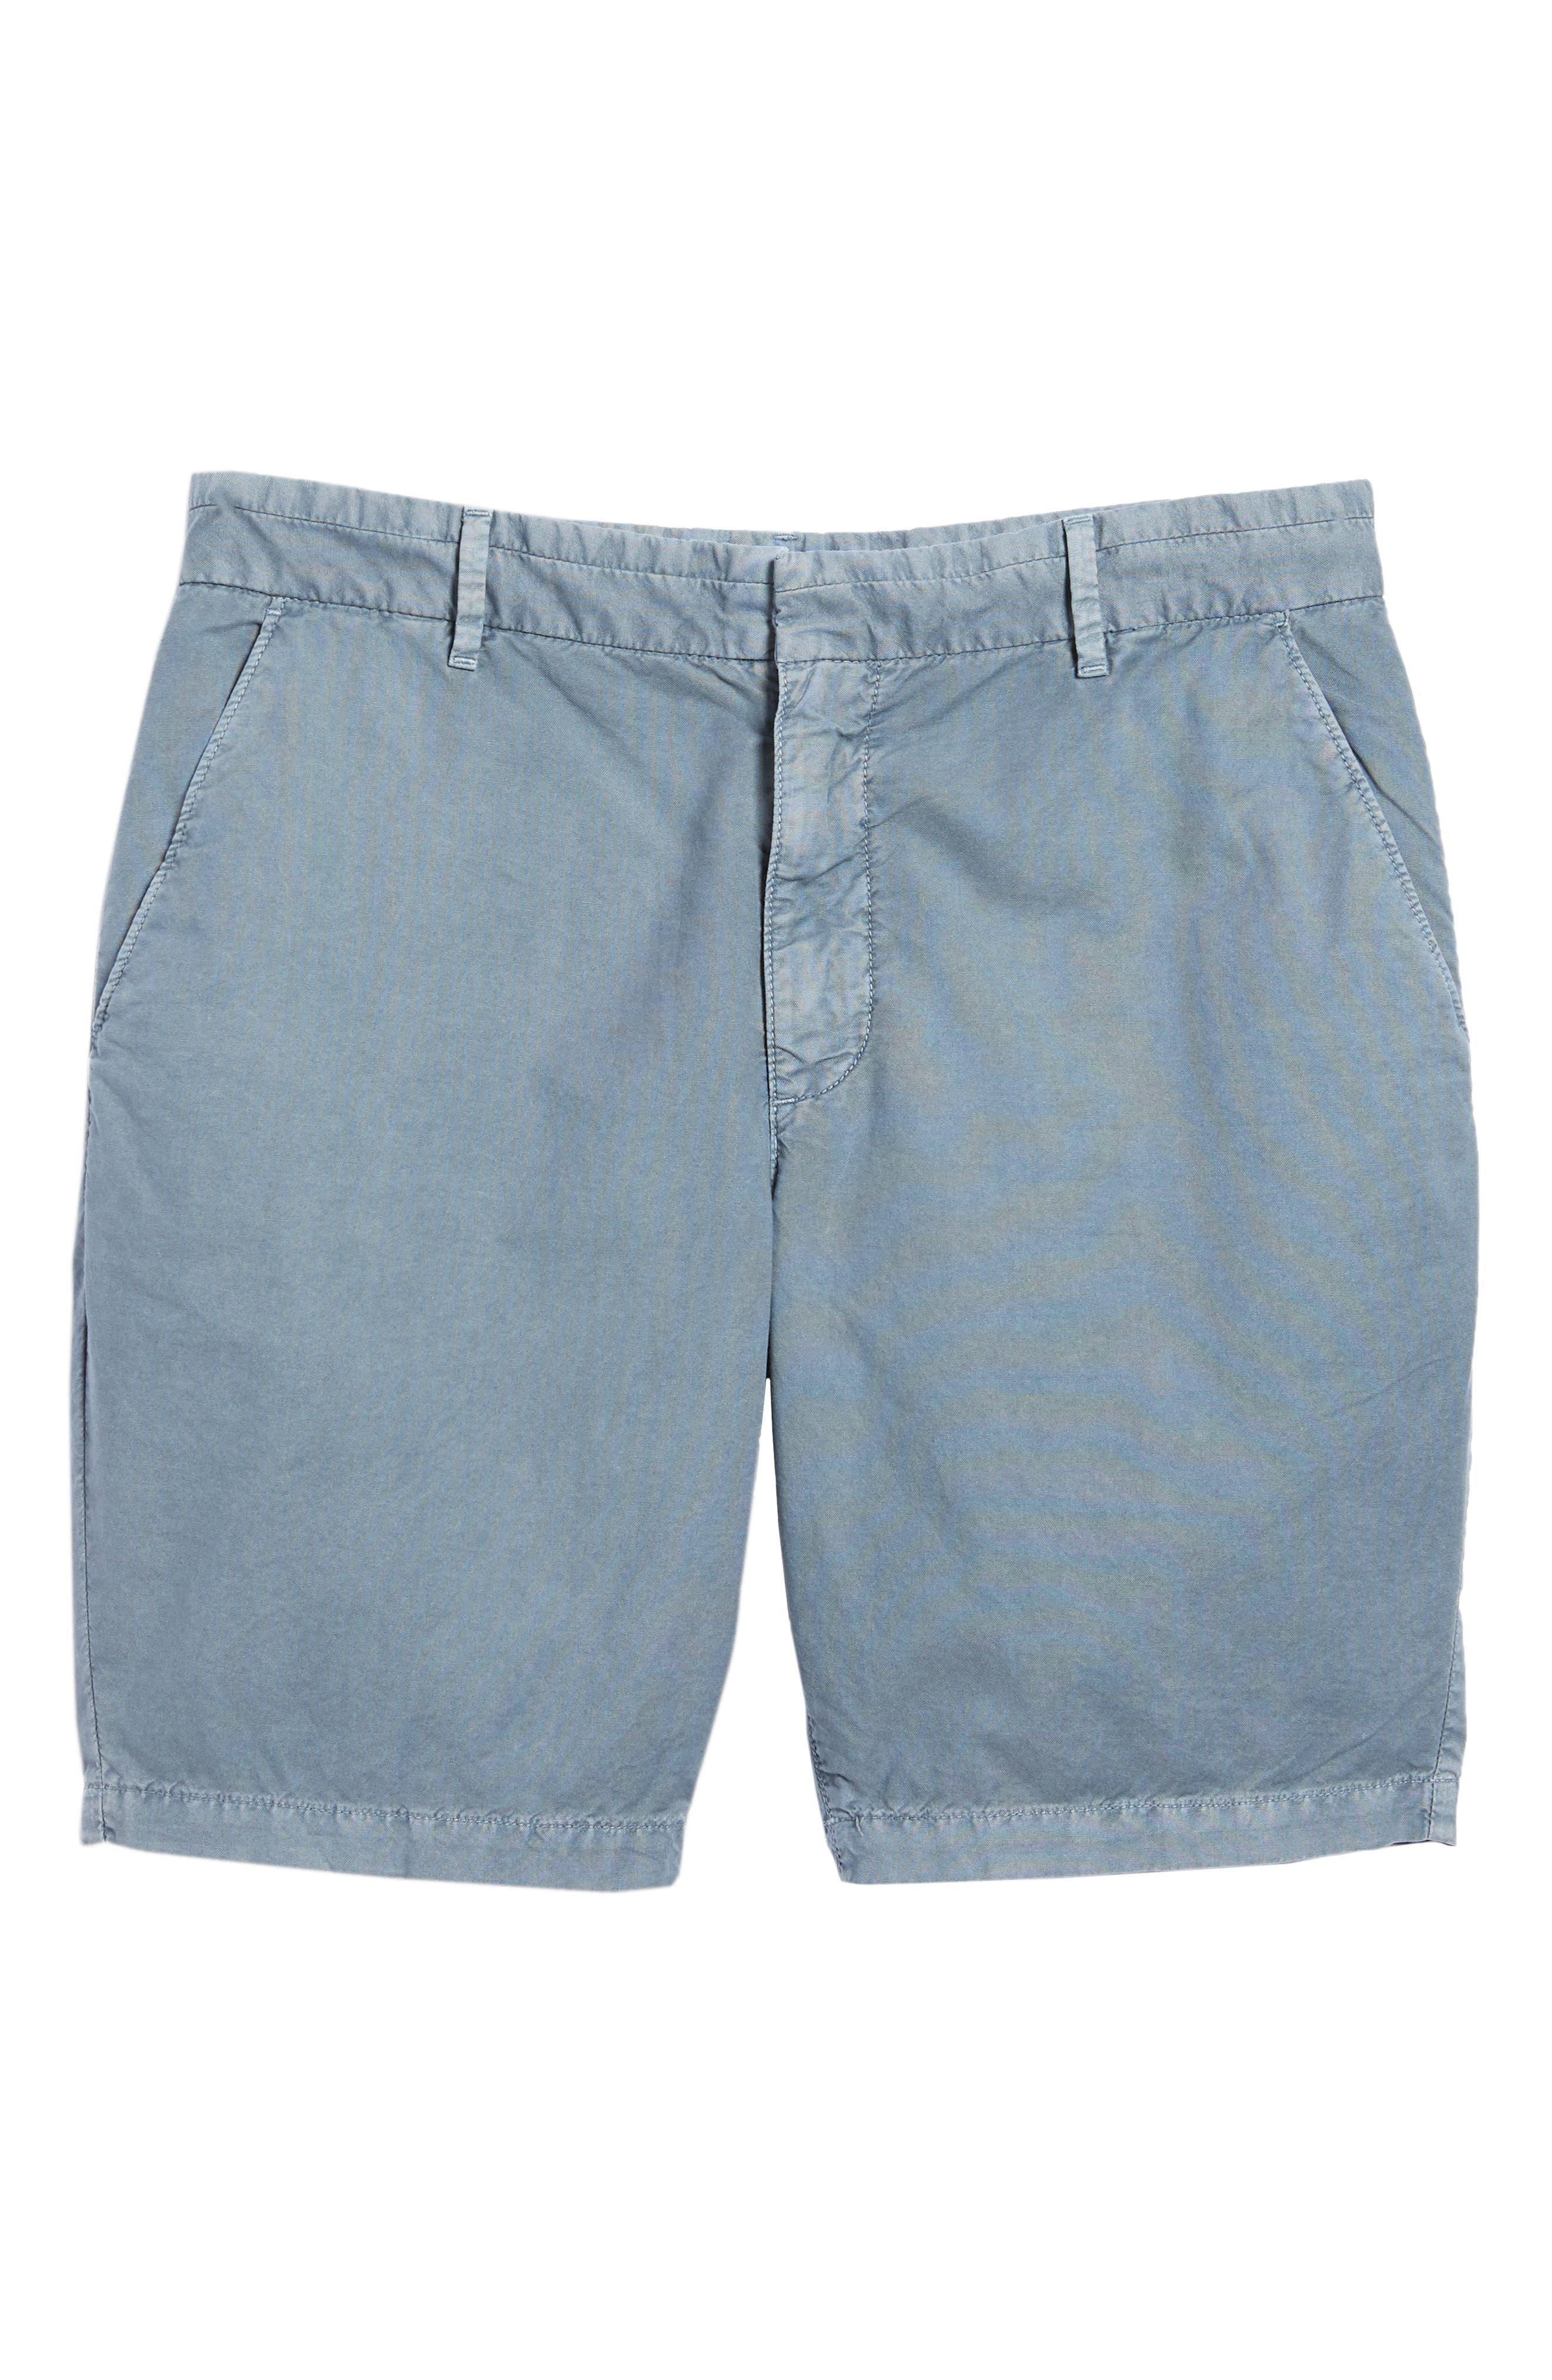 Butter Ball Shorts,                             Alternate thumbnail 6, color,                             BLUE SLATE